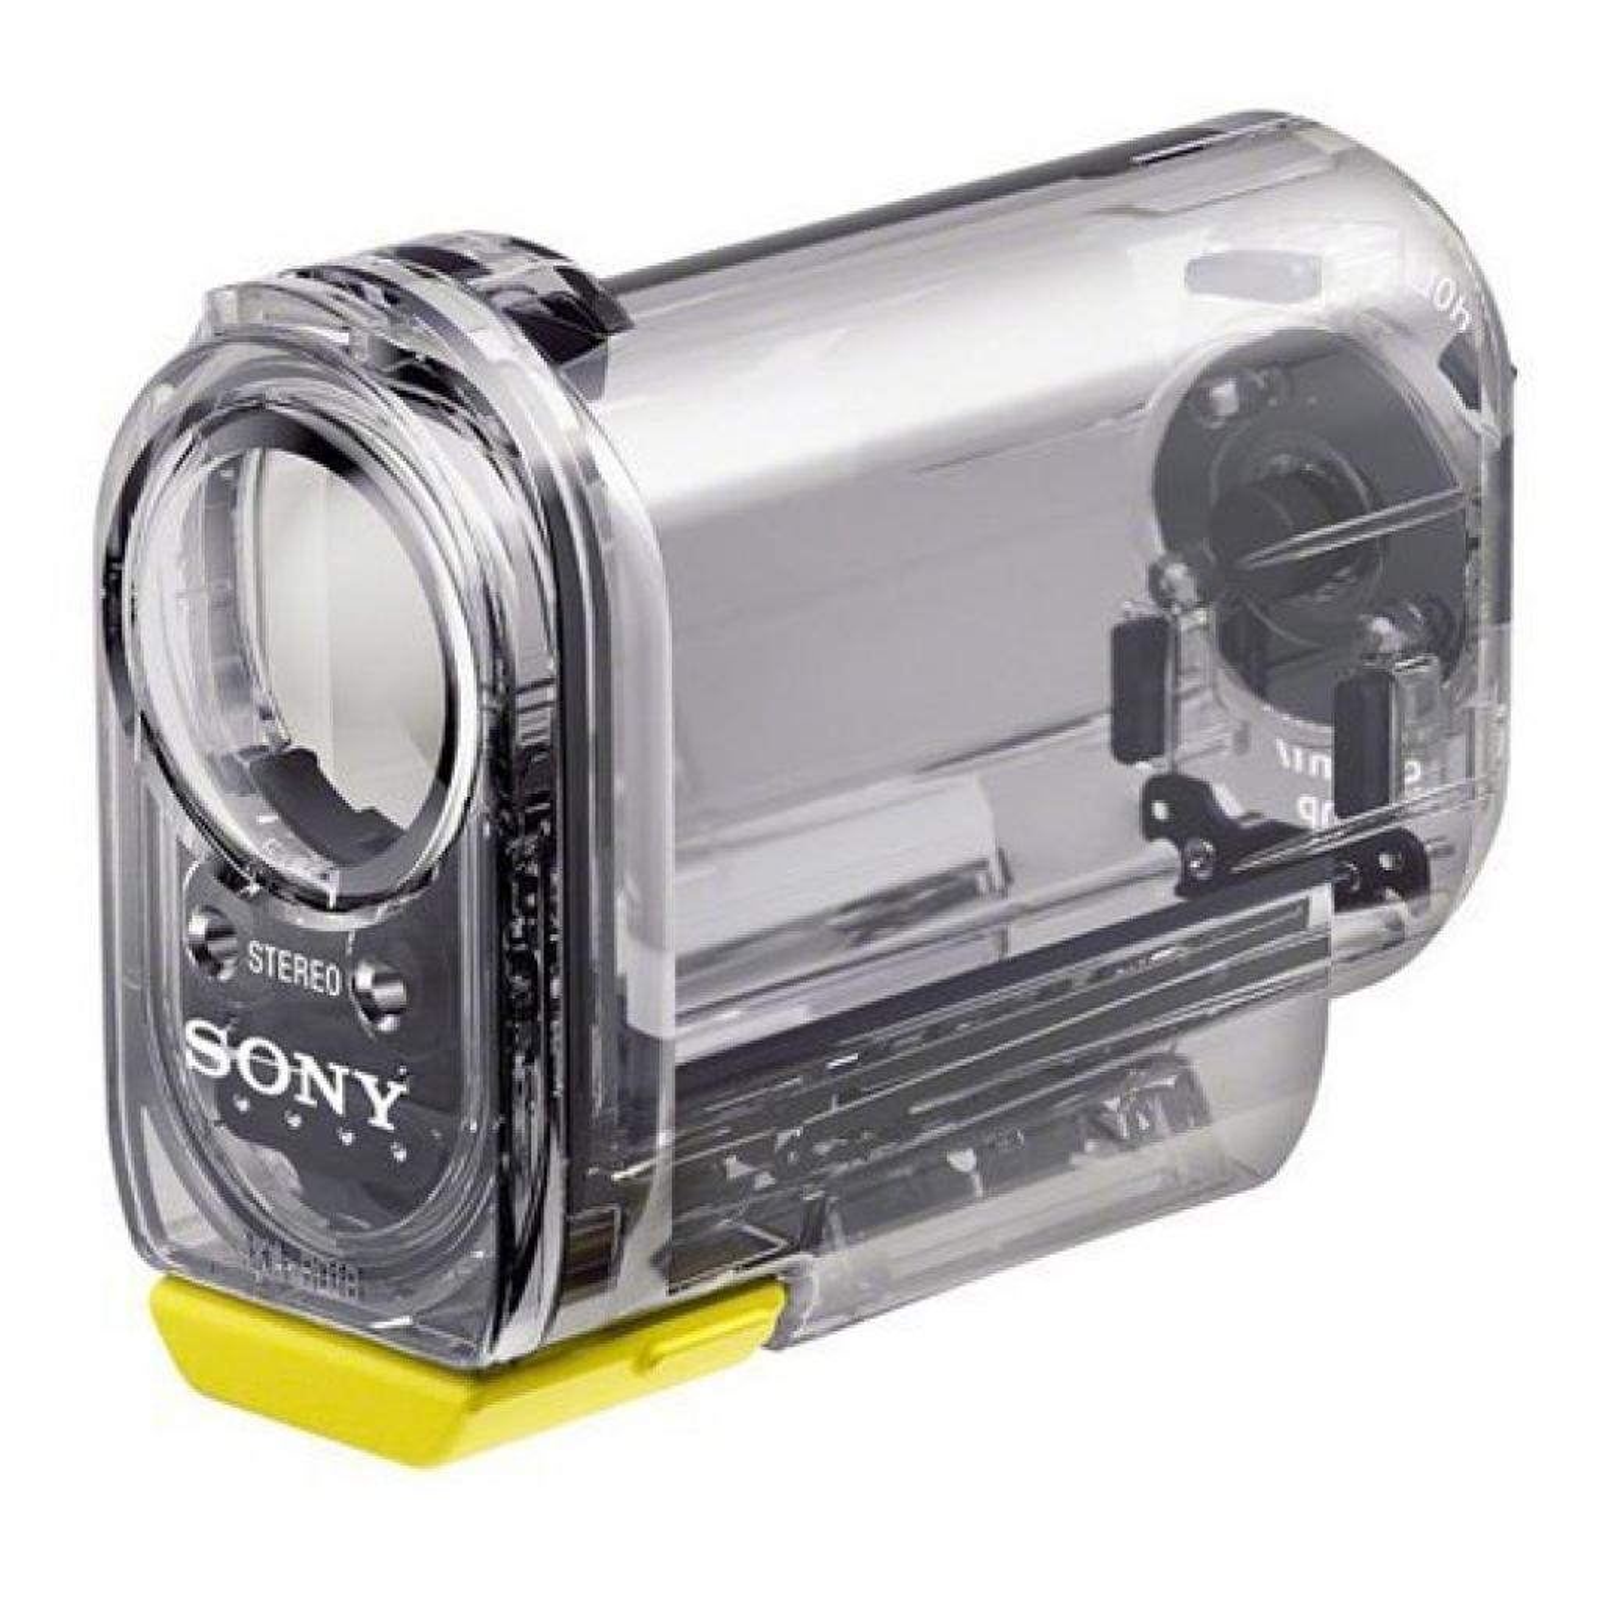 Комплект SONY AKA-RD1 (AKARD1.SYH) изображение 5